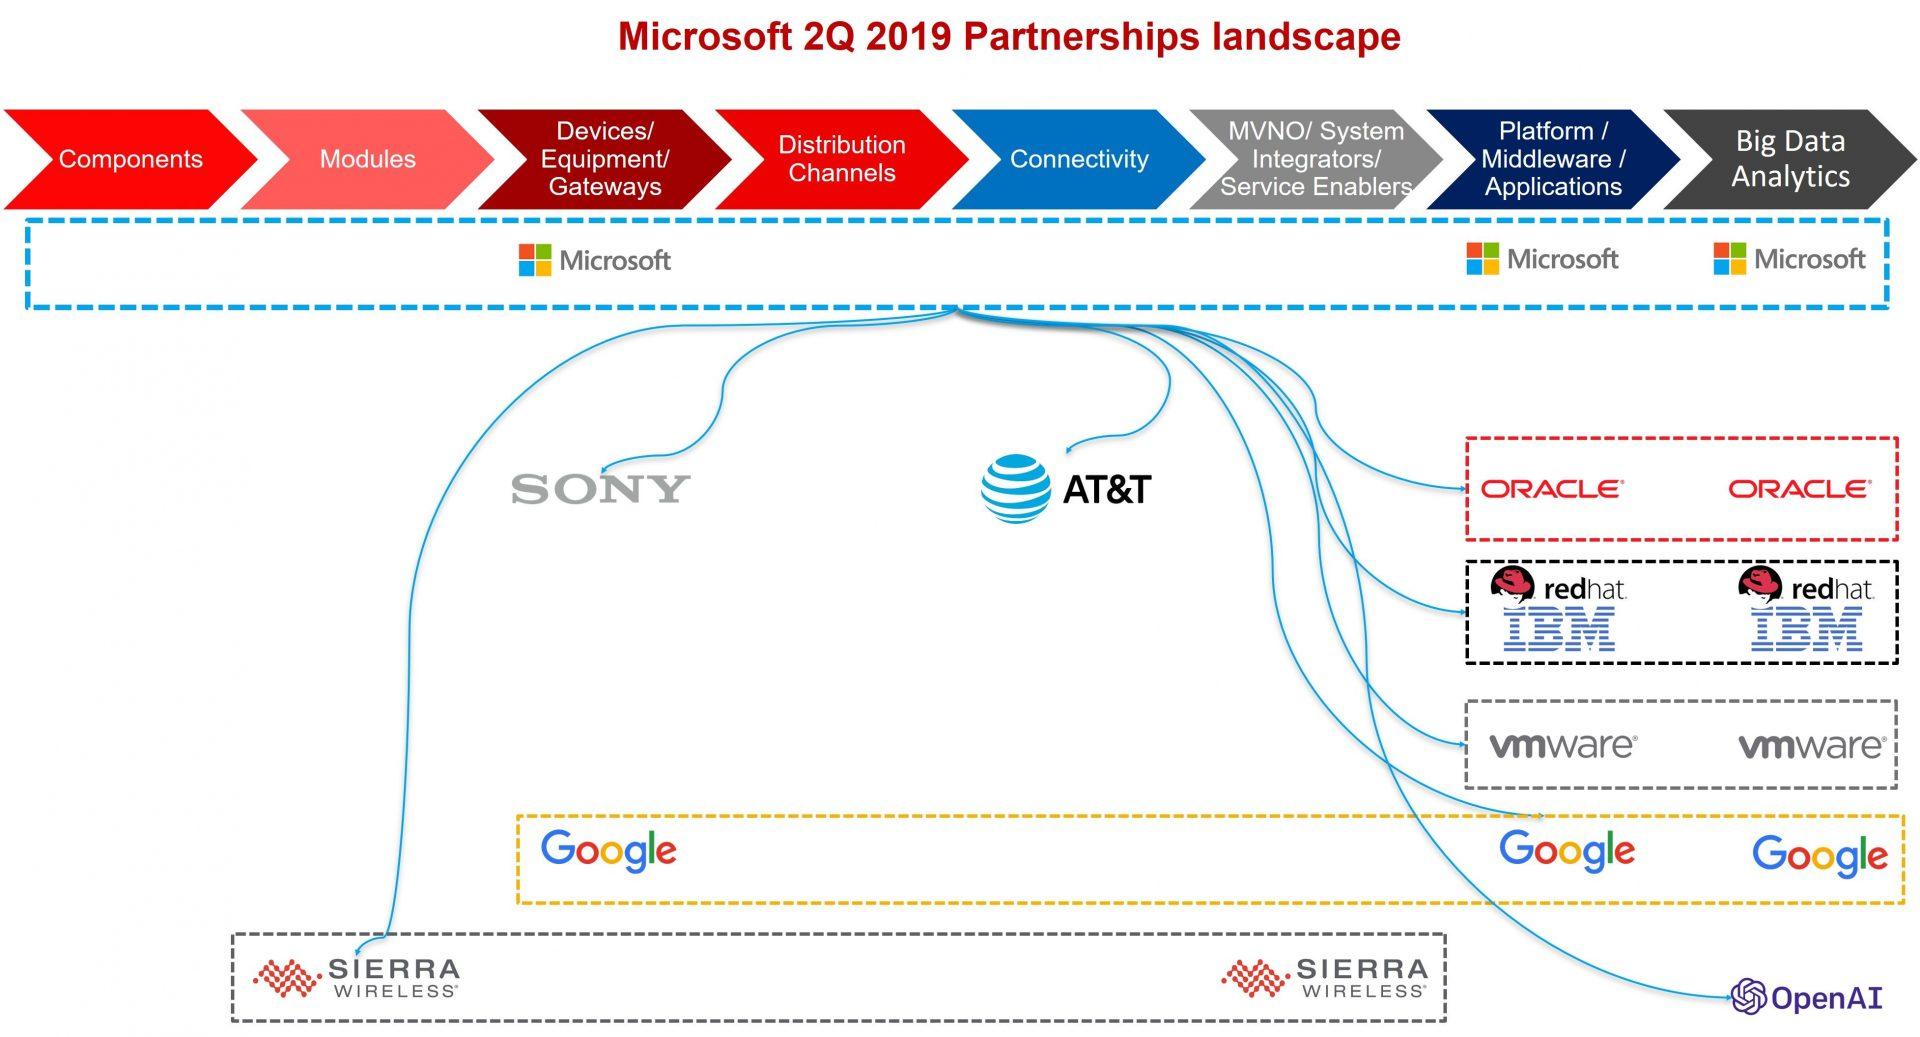 Microsoft 2Q 2019 Partnerships landscape